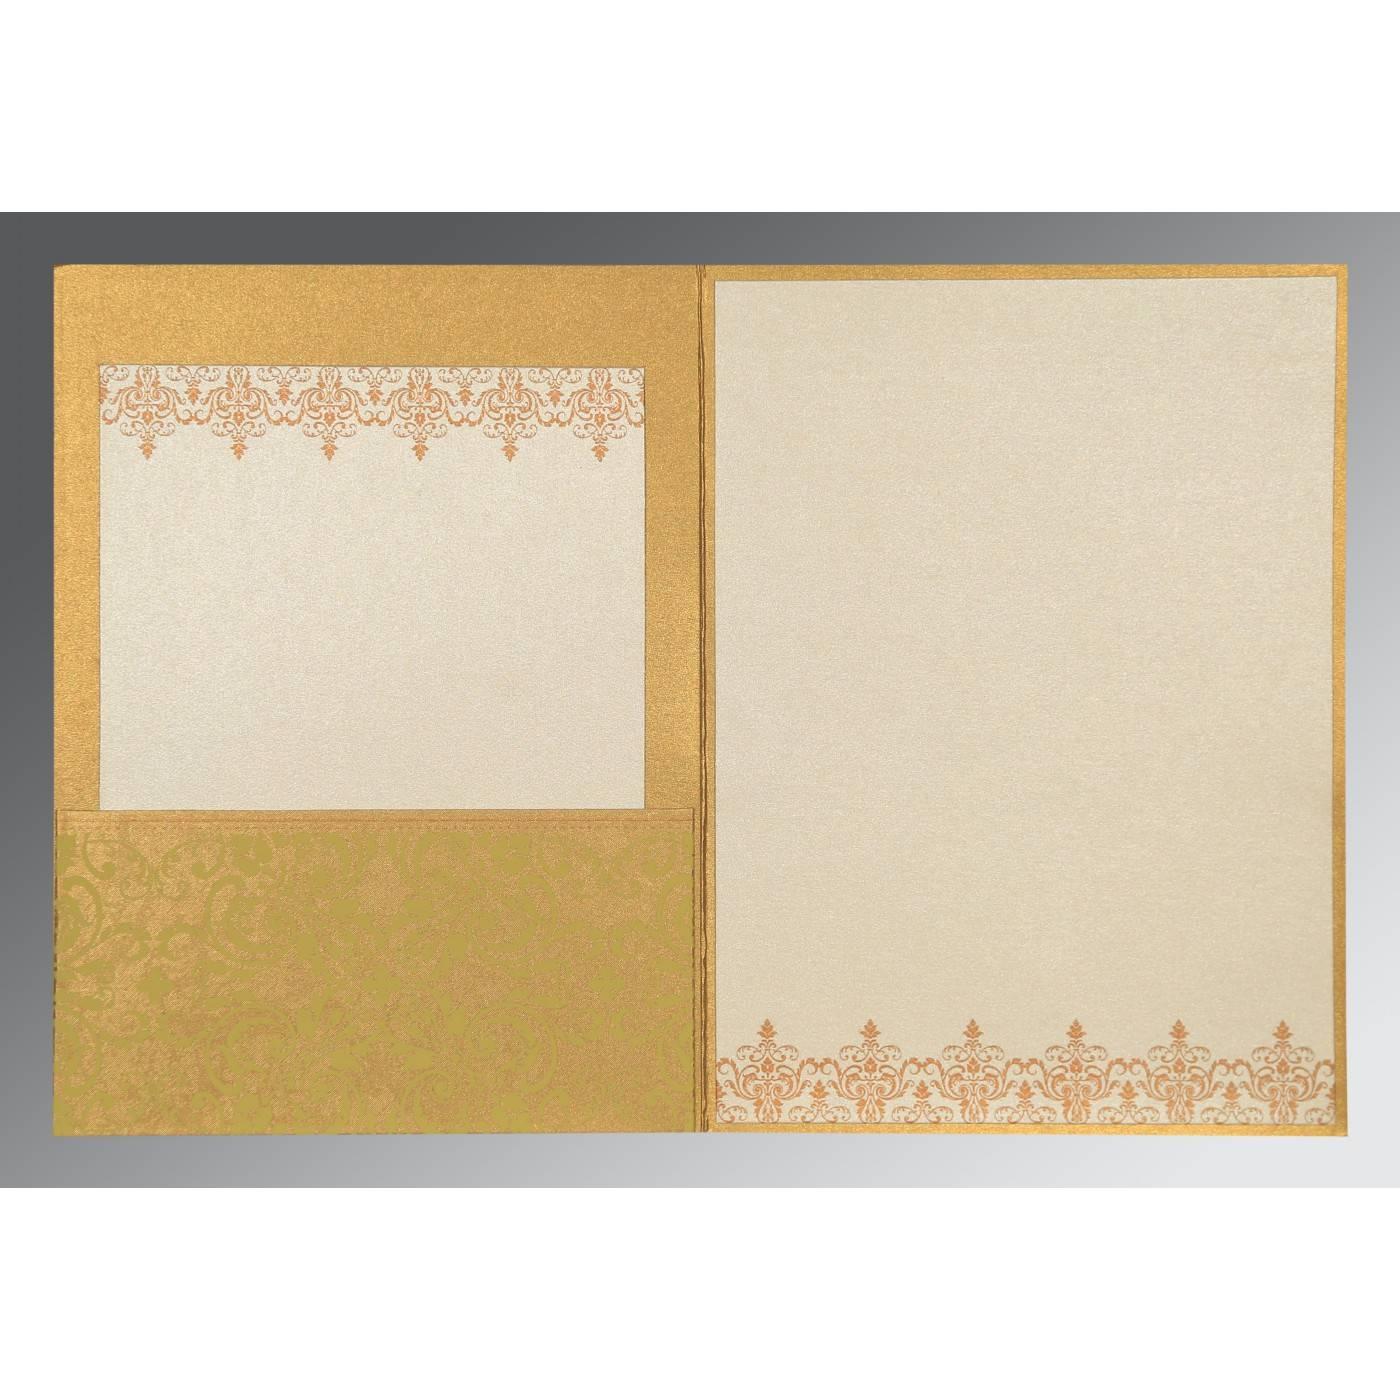 SATIN GOLD SHIMMERY SCREEN PRINTED WEDDING CARD : CG-8244G - IndianWeddingCards